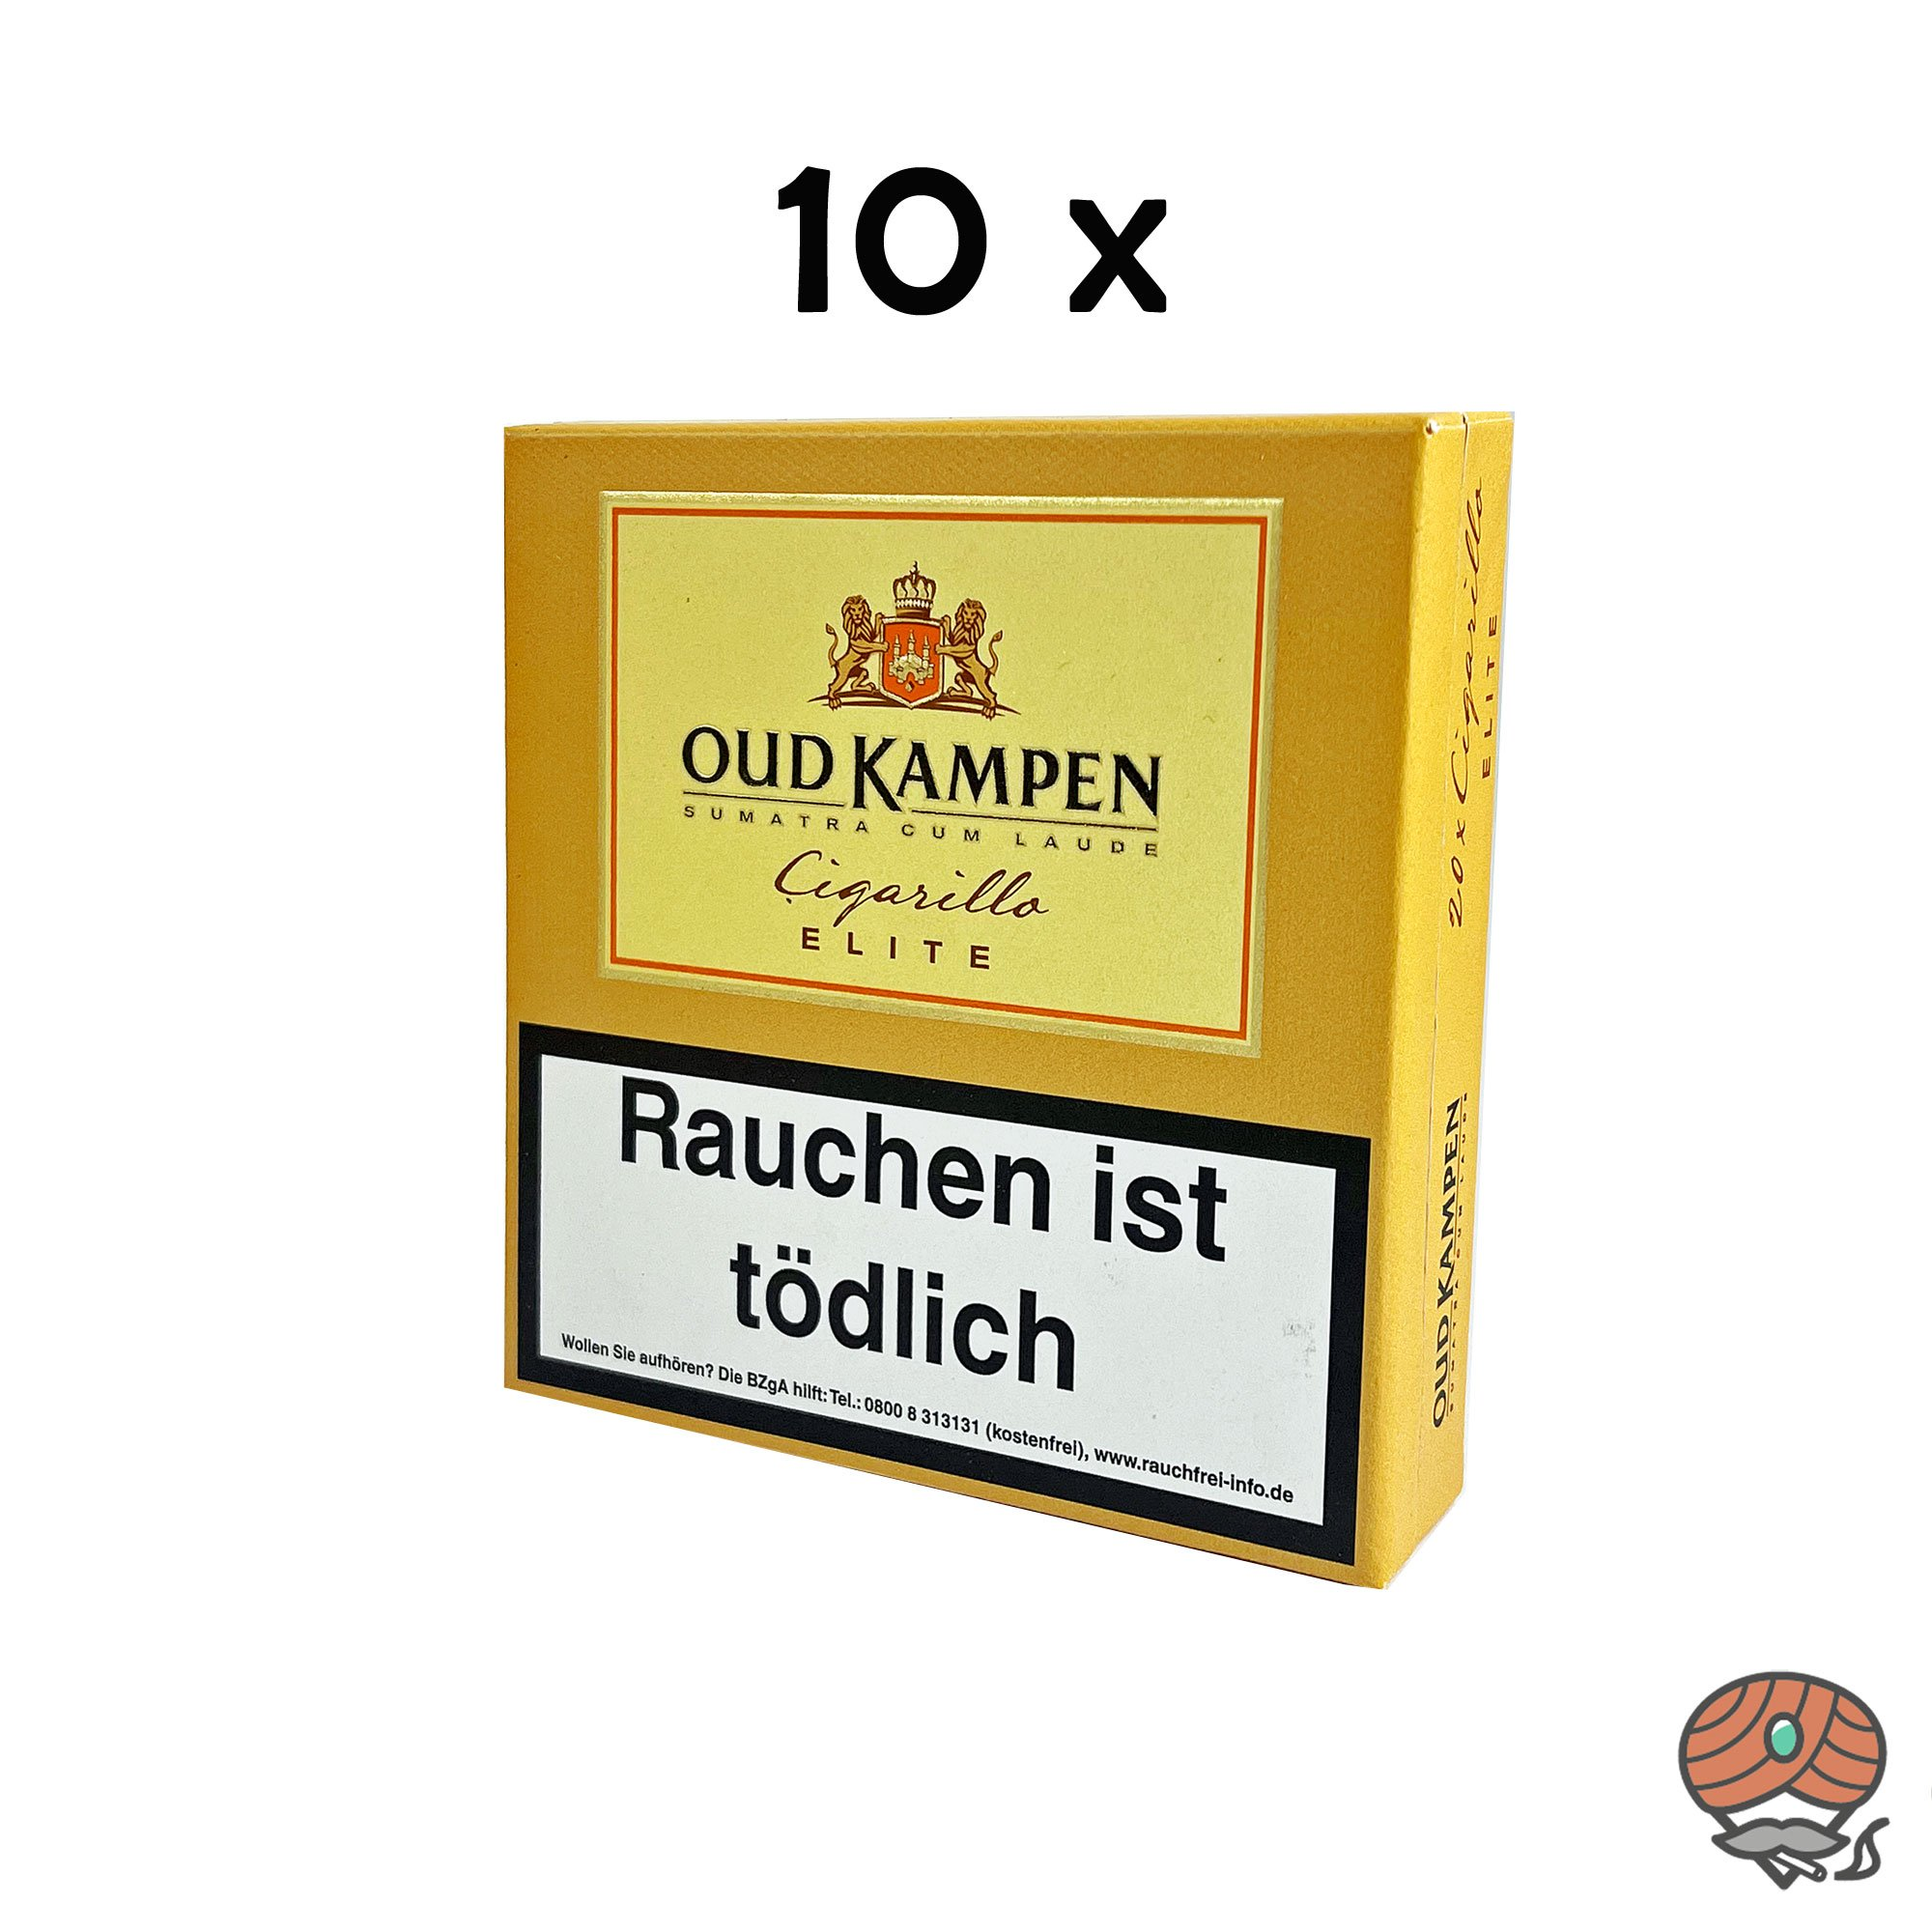 10x Oud Kampen Elite Zigarillos Sumatra Cum Laude 100% Tabak